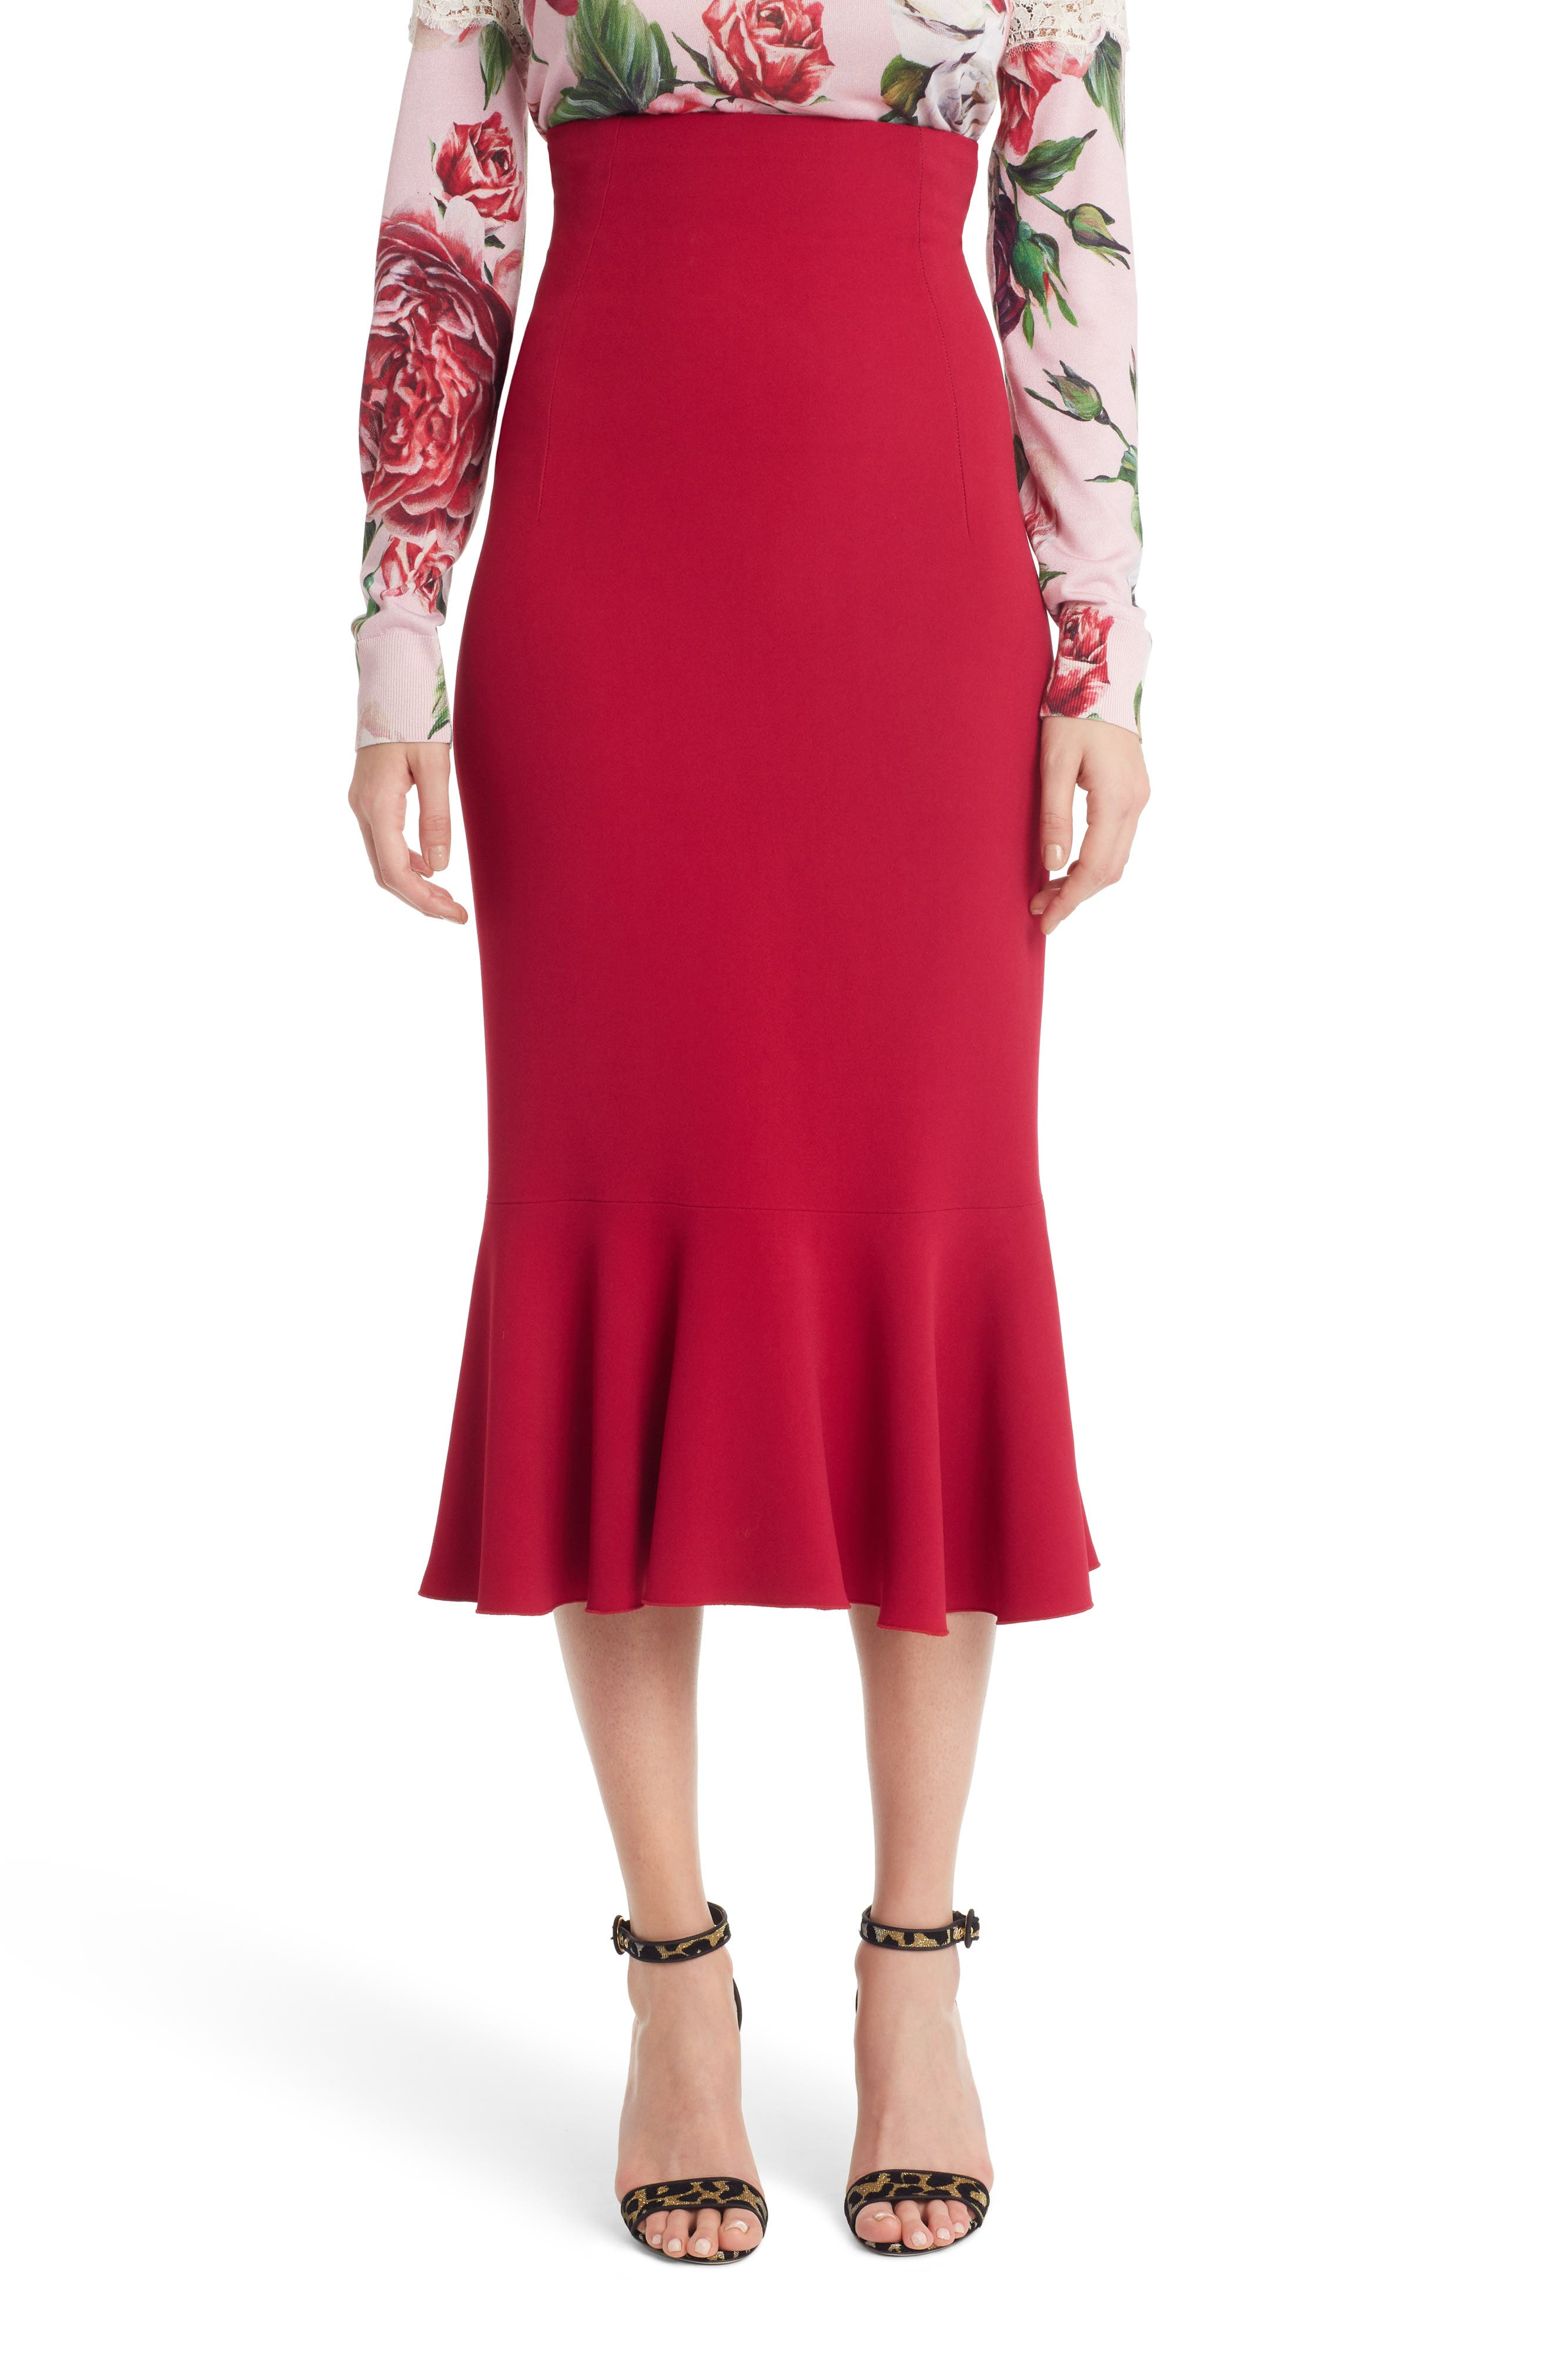 Dolce&Gabbana Ruffle Hem Cady Pencil Skirt